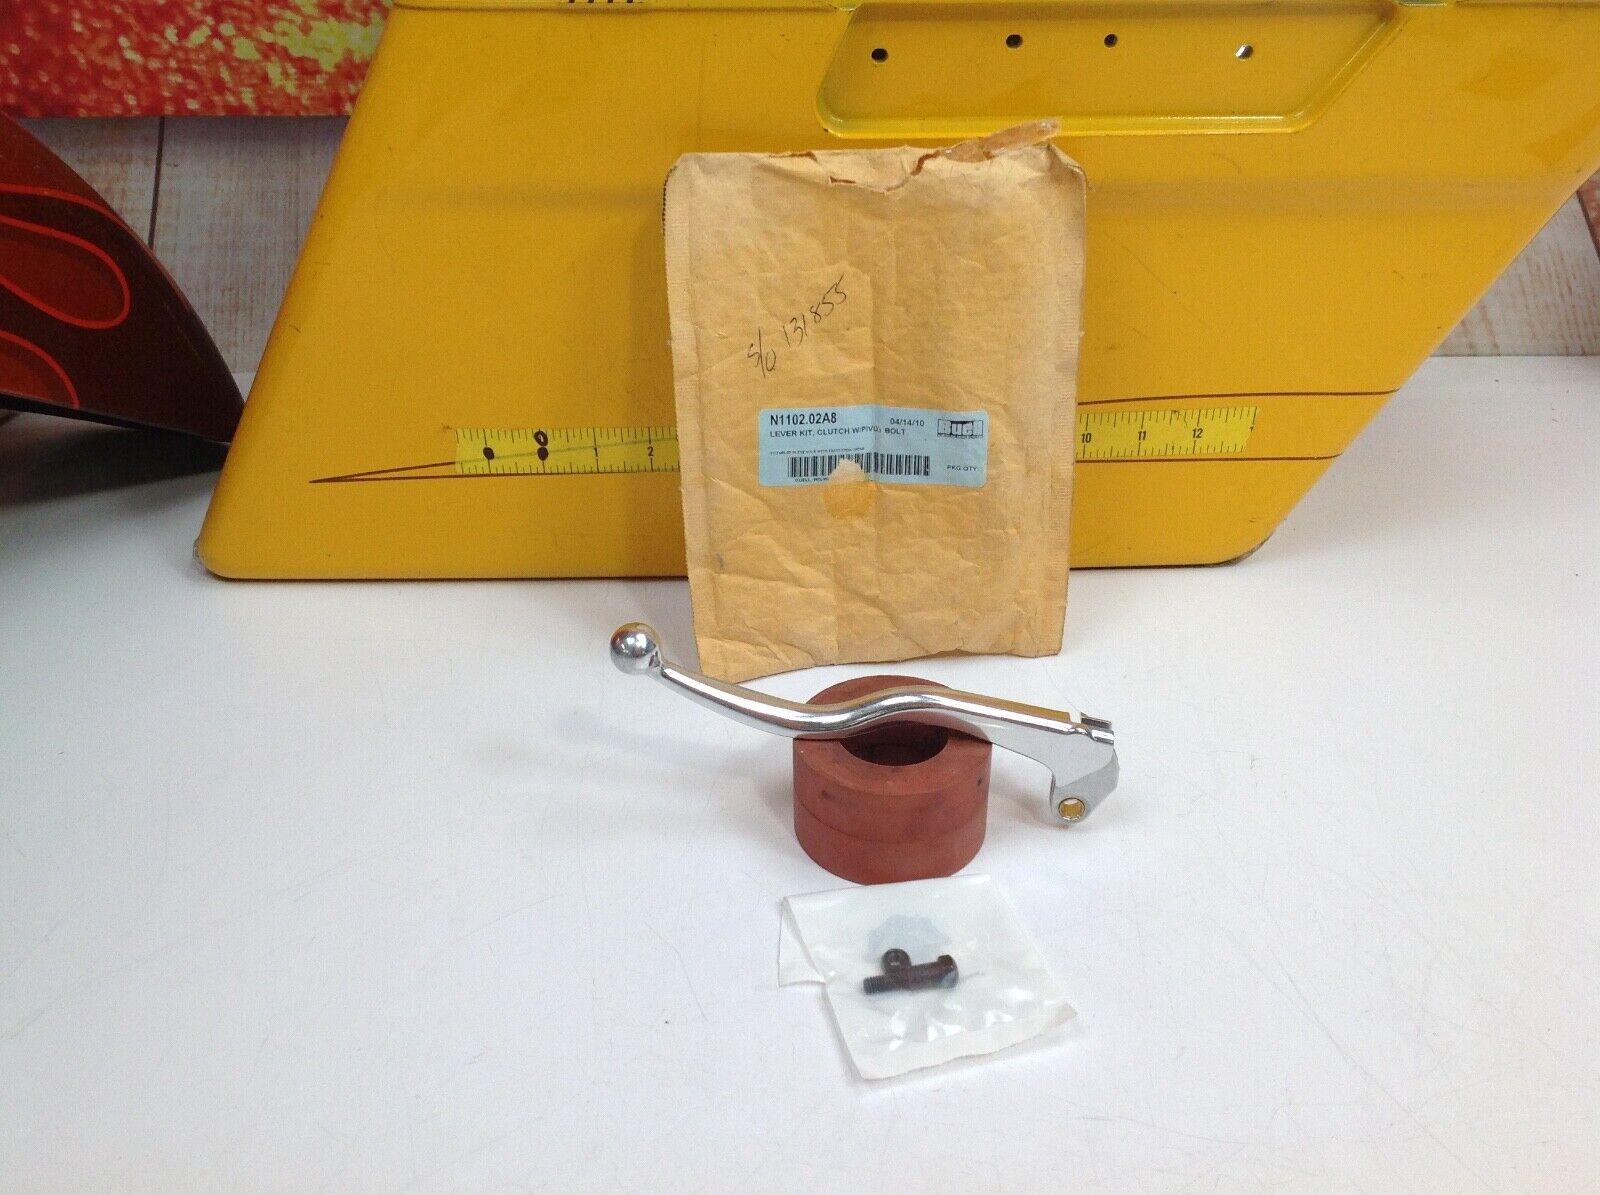 B3L XB9 OEM Clutch Lever Kit N1102.02A8 NEW Buell P3 XB12